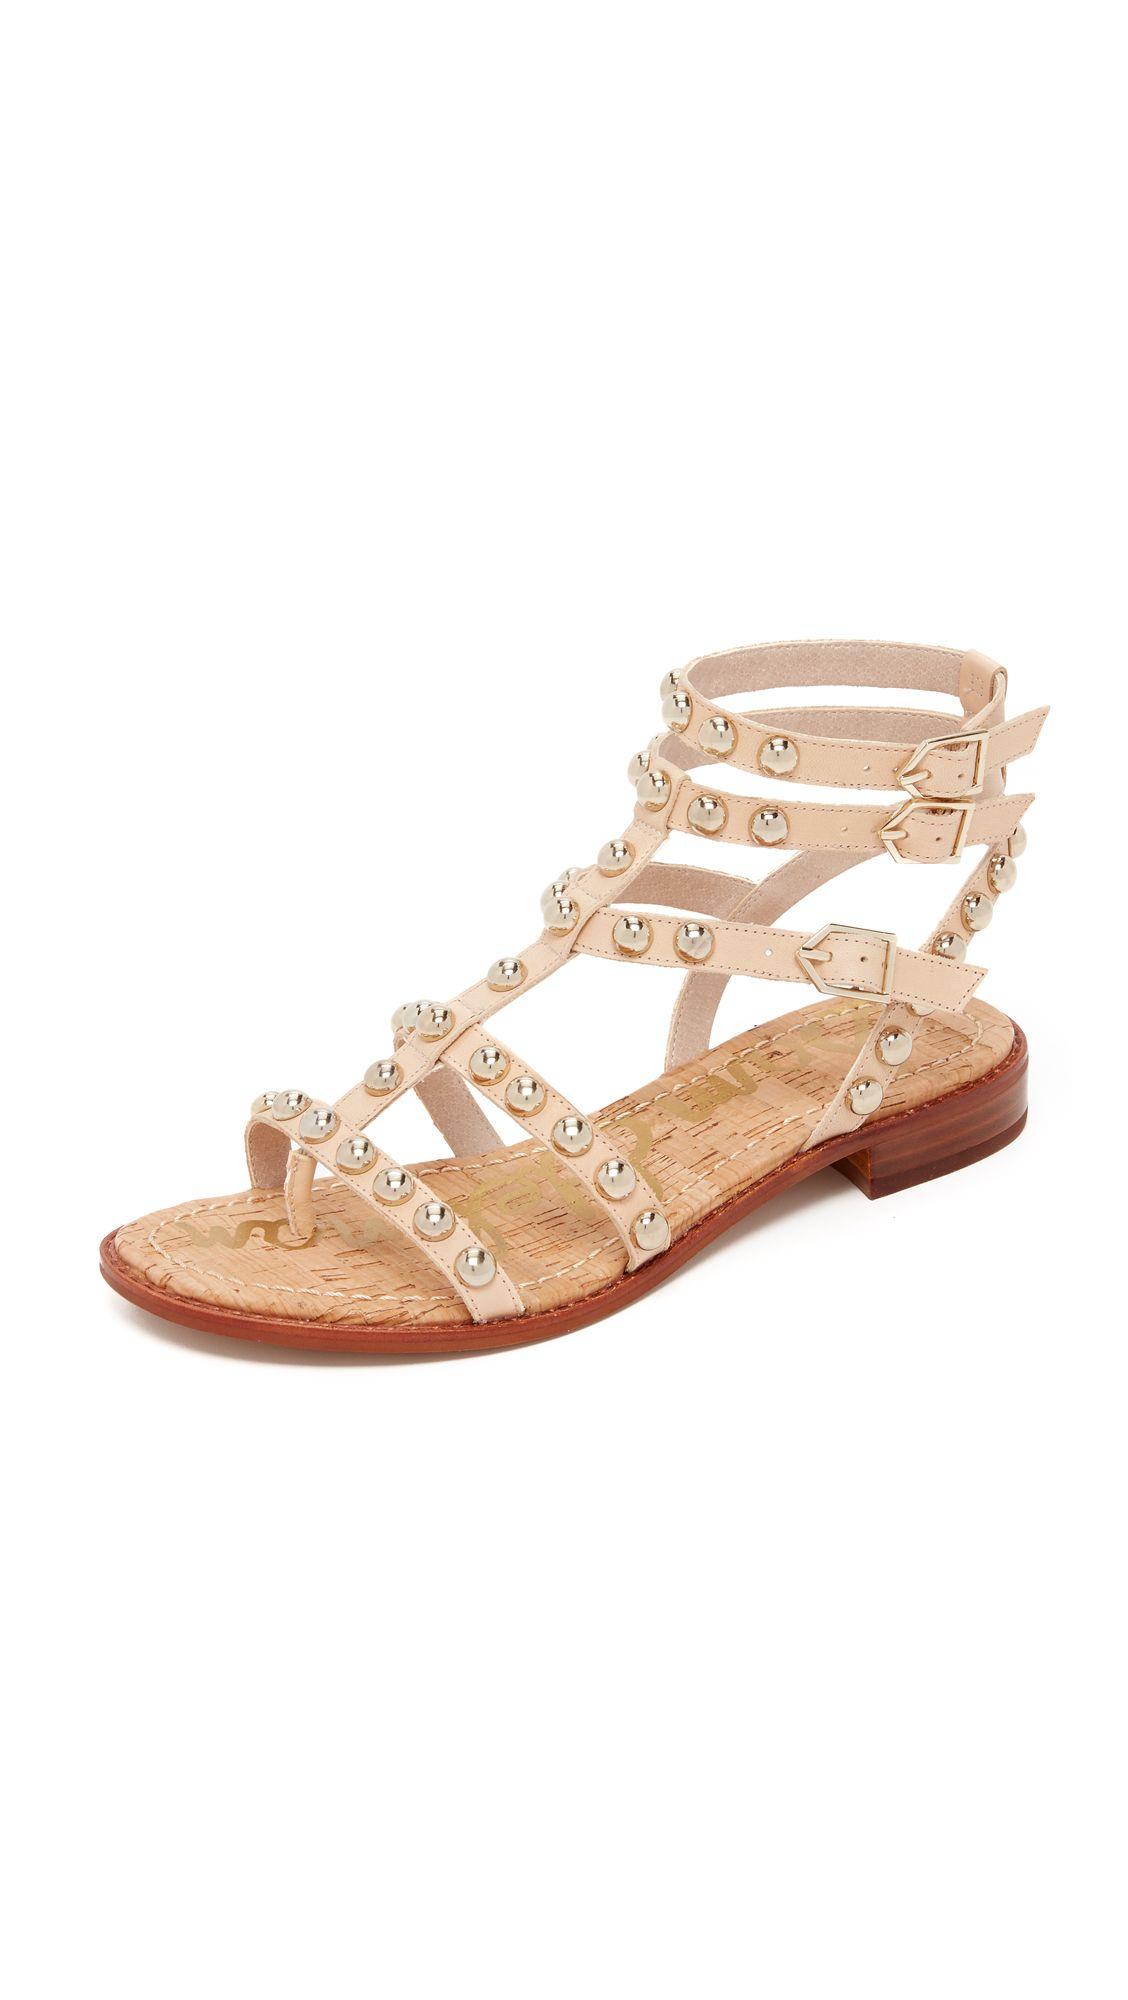 60c113ad762e Sam Edelman Eavan Gladiator Sandals - Natural Naked